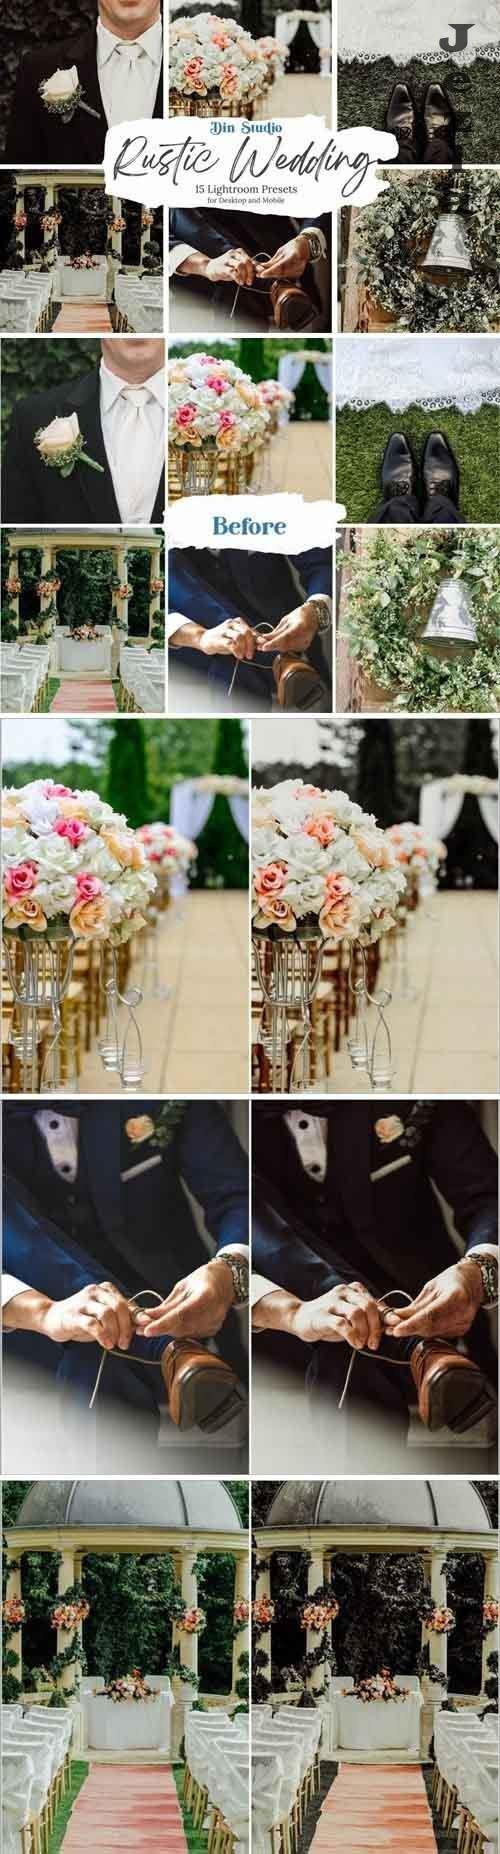 CreativeMarket - Rustic Wedding Lightroom Presets 5481913